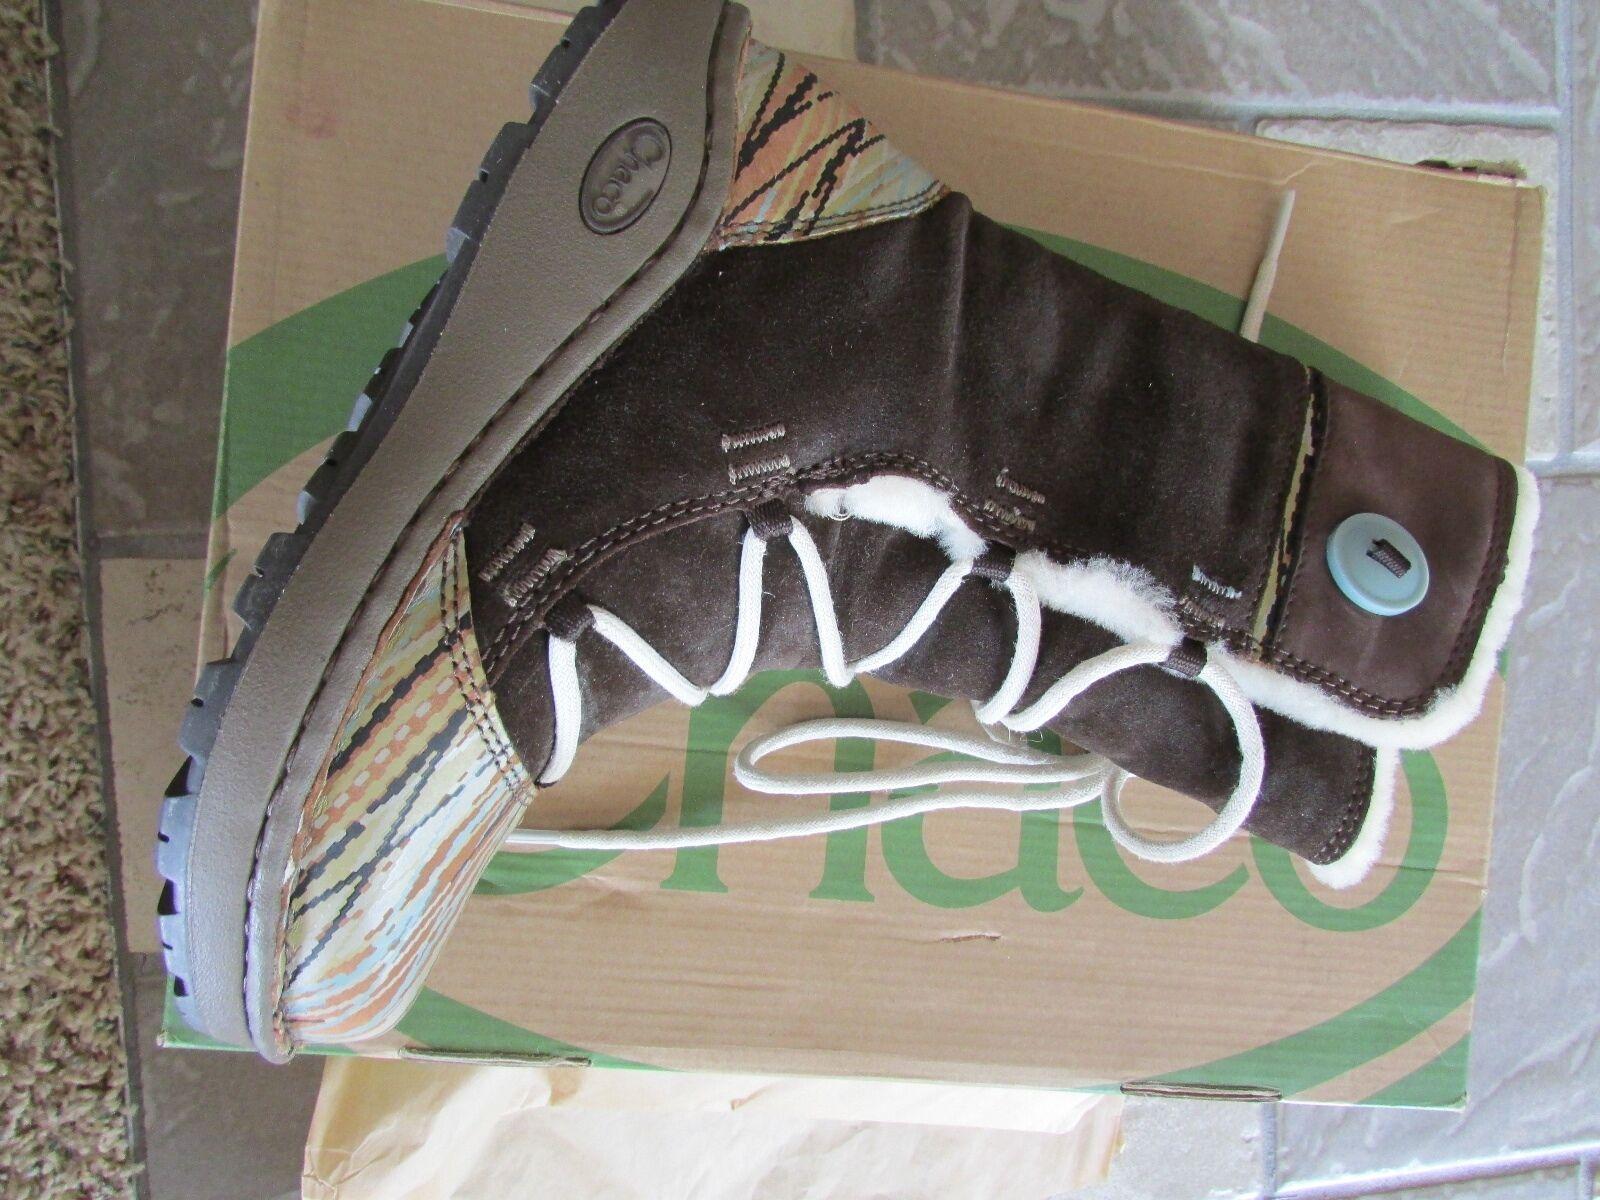 Nuevo Hlaalu Baa Baa Baa Oveja Chaco Forrado botas De Invierno Para Mujer 7 14b431